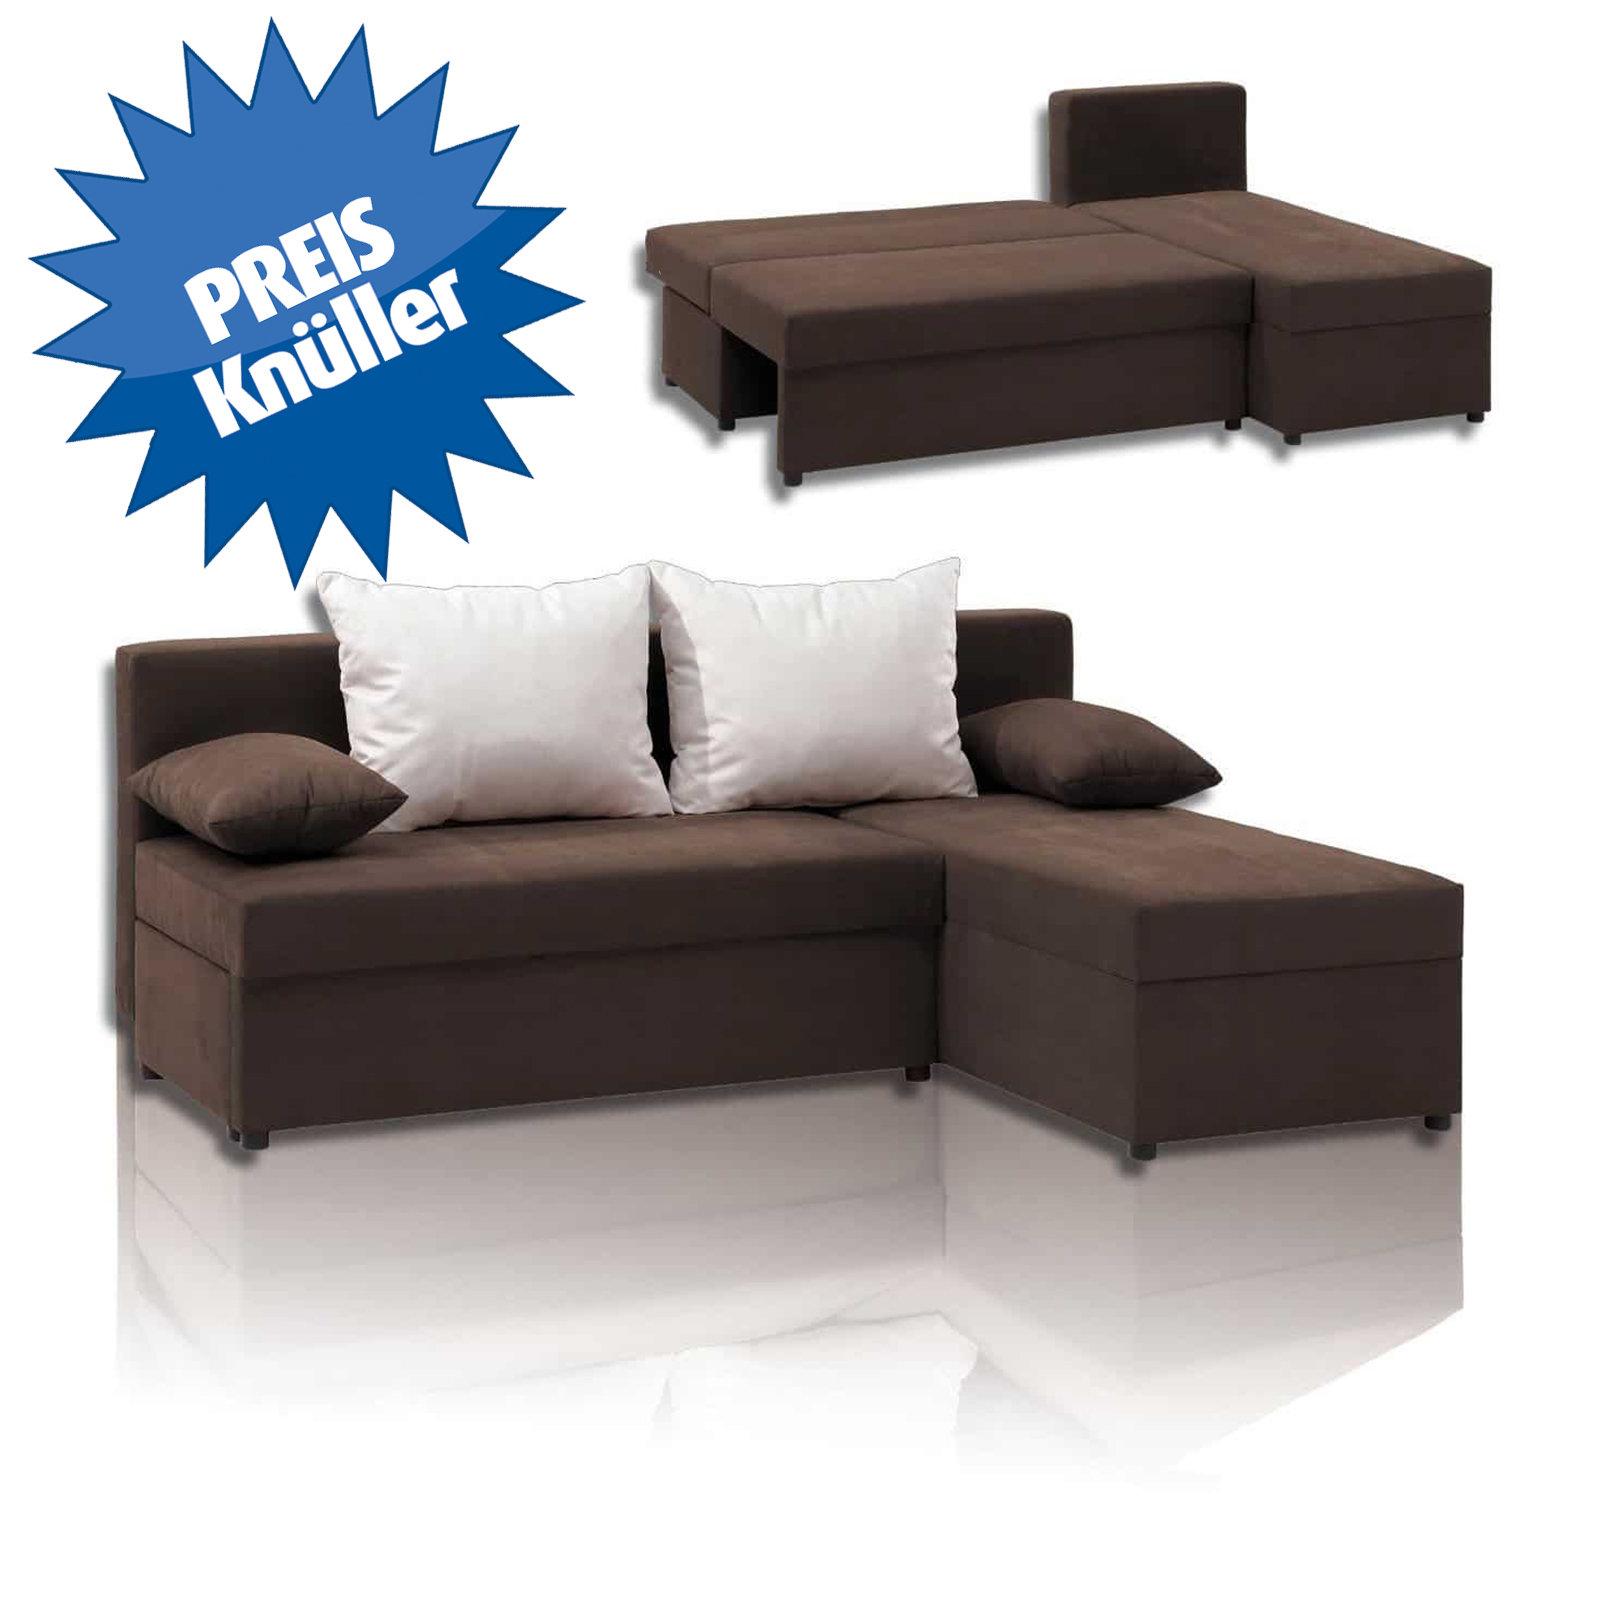 polsterecke braun mit liegefunktion m bel24. Black Bedroom Furniture Sets. Home Design Ideas